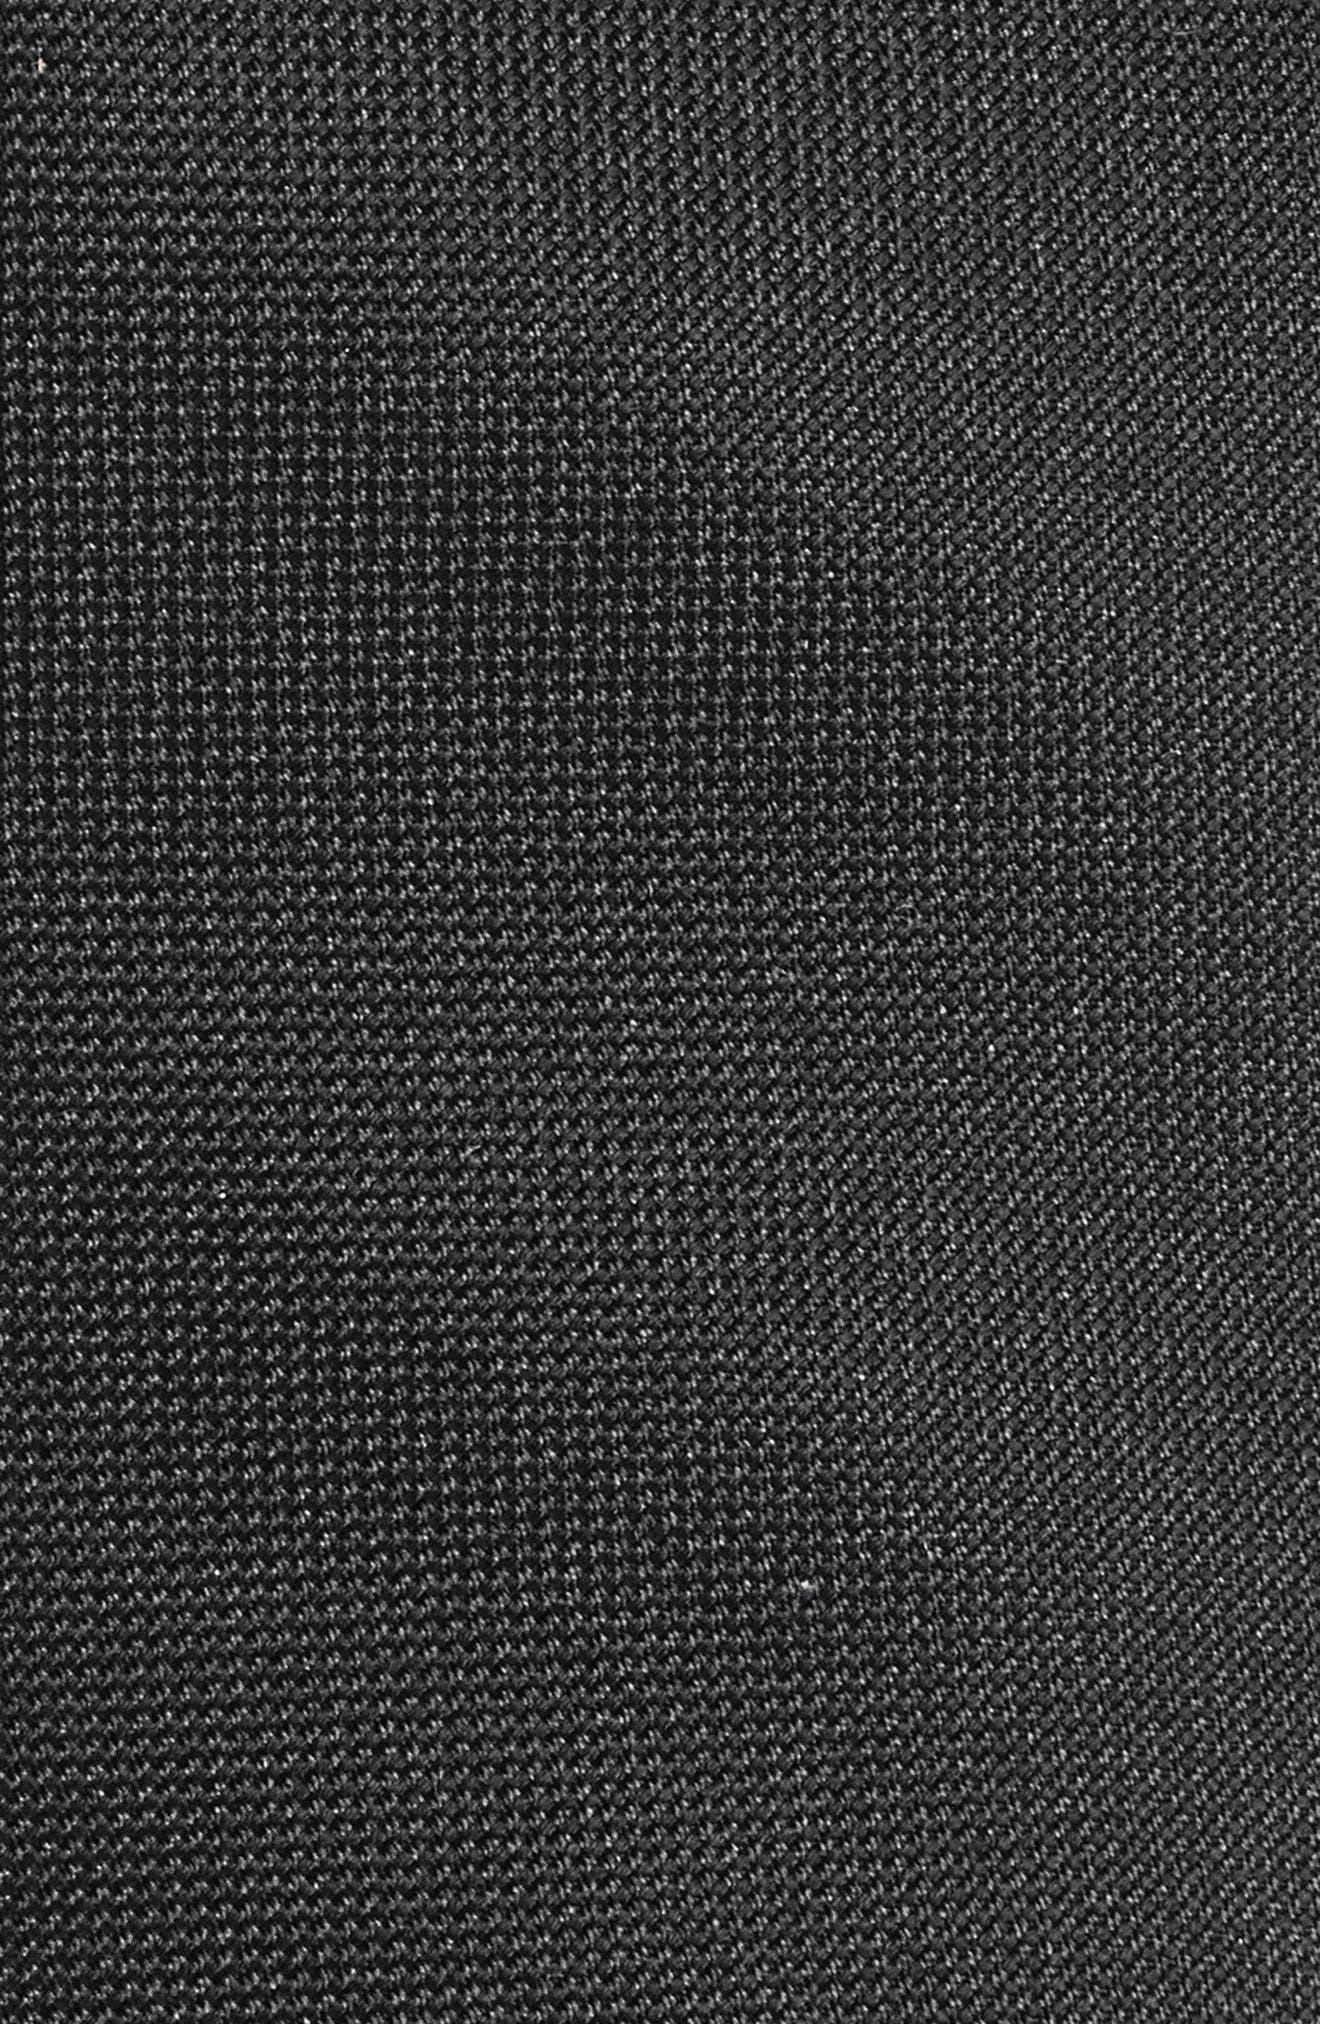 Foley Silk Tie,                             Alternate thumbnail 2, color,                             002